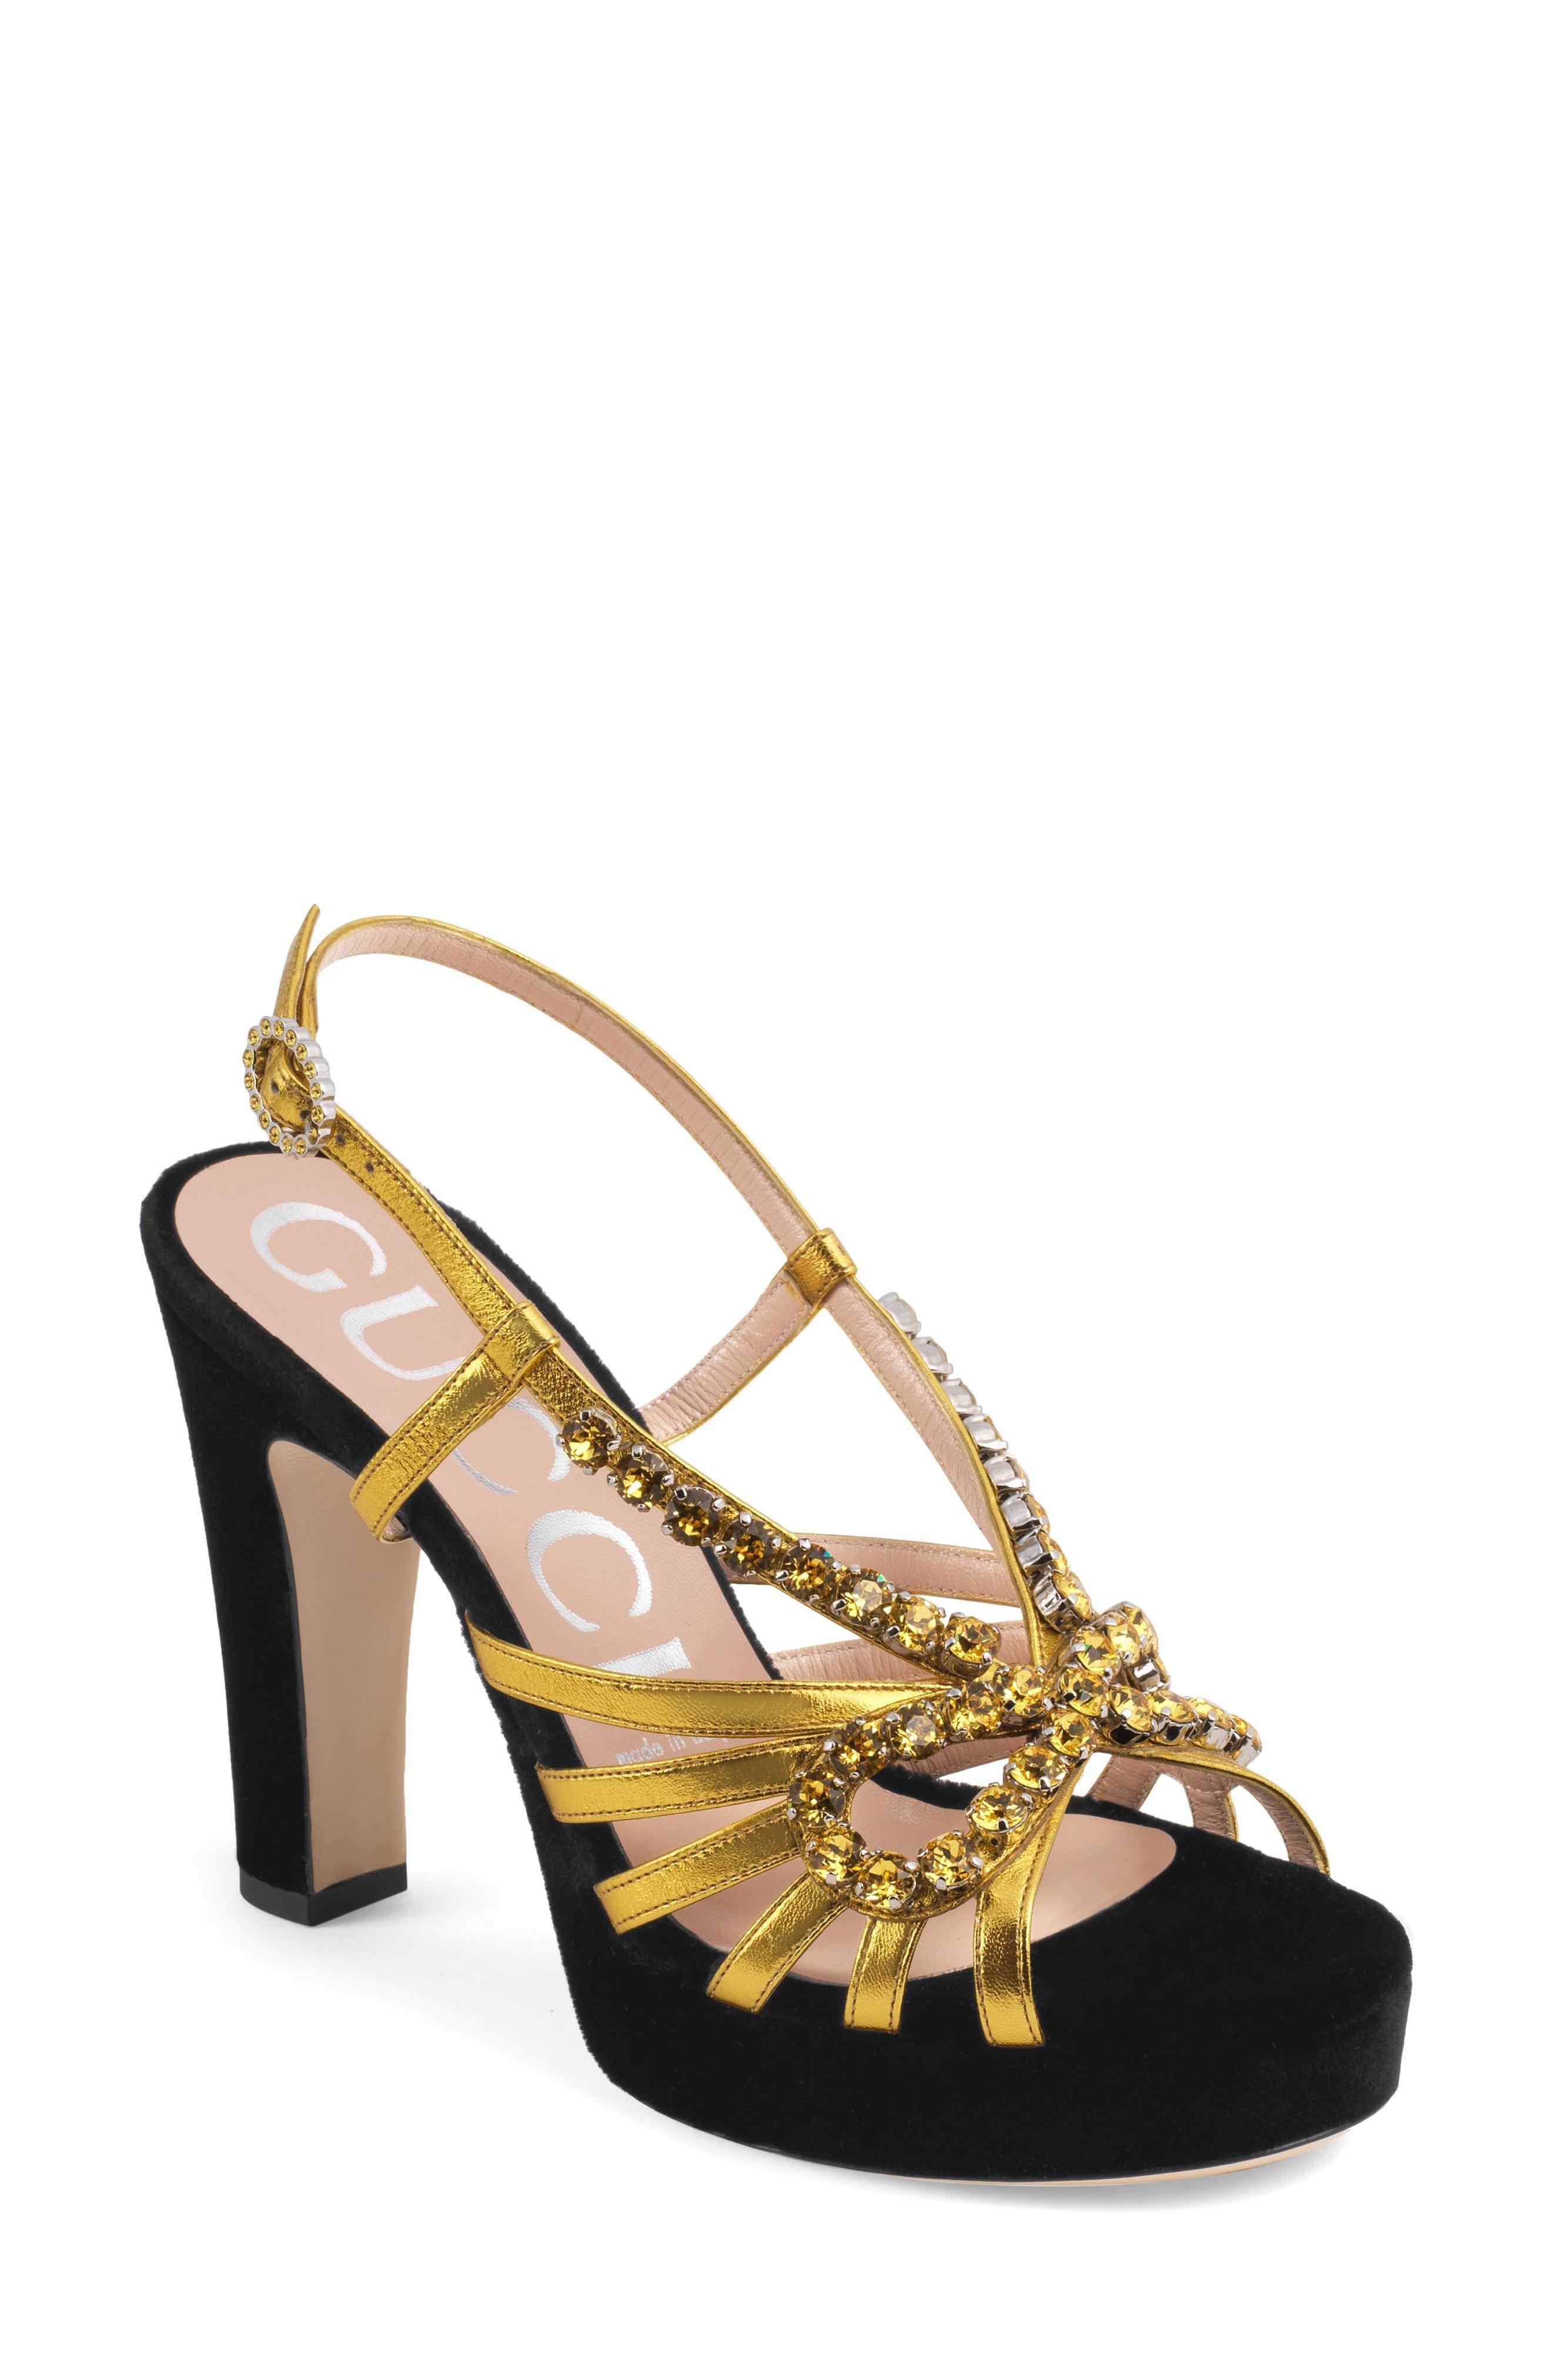 ae489e368a8 Lyst - Gucci Zephyra Jewel Sandal in Metallic